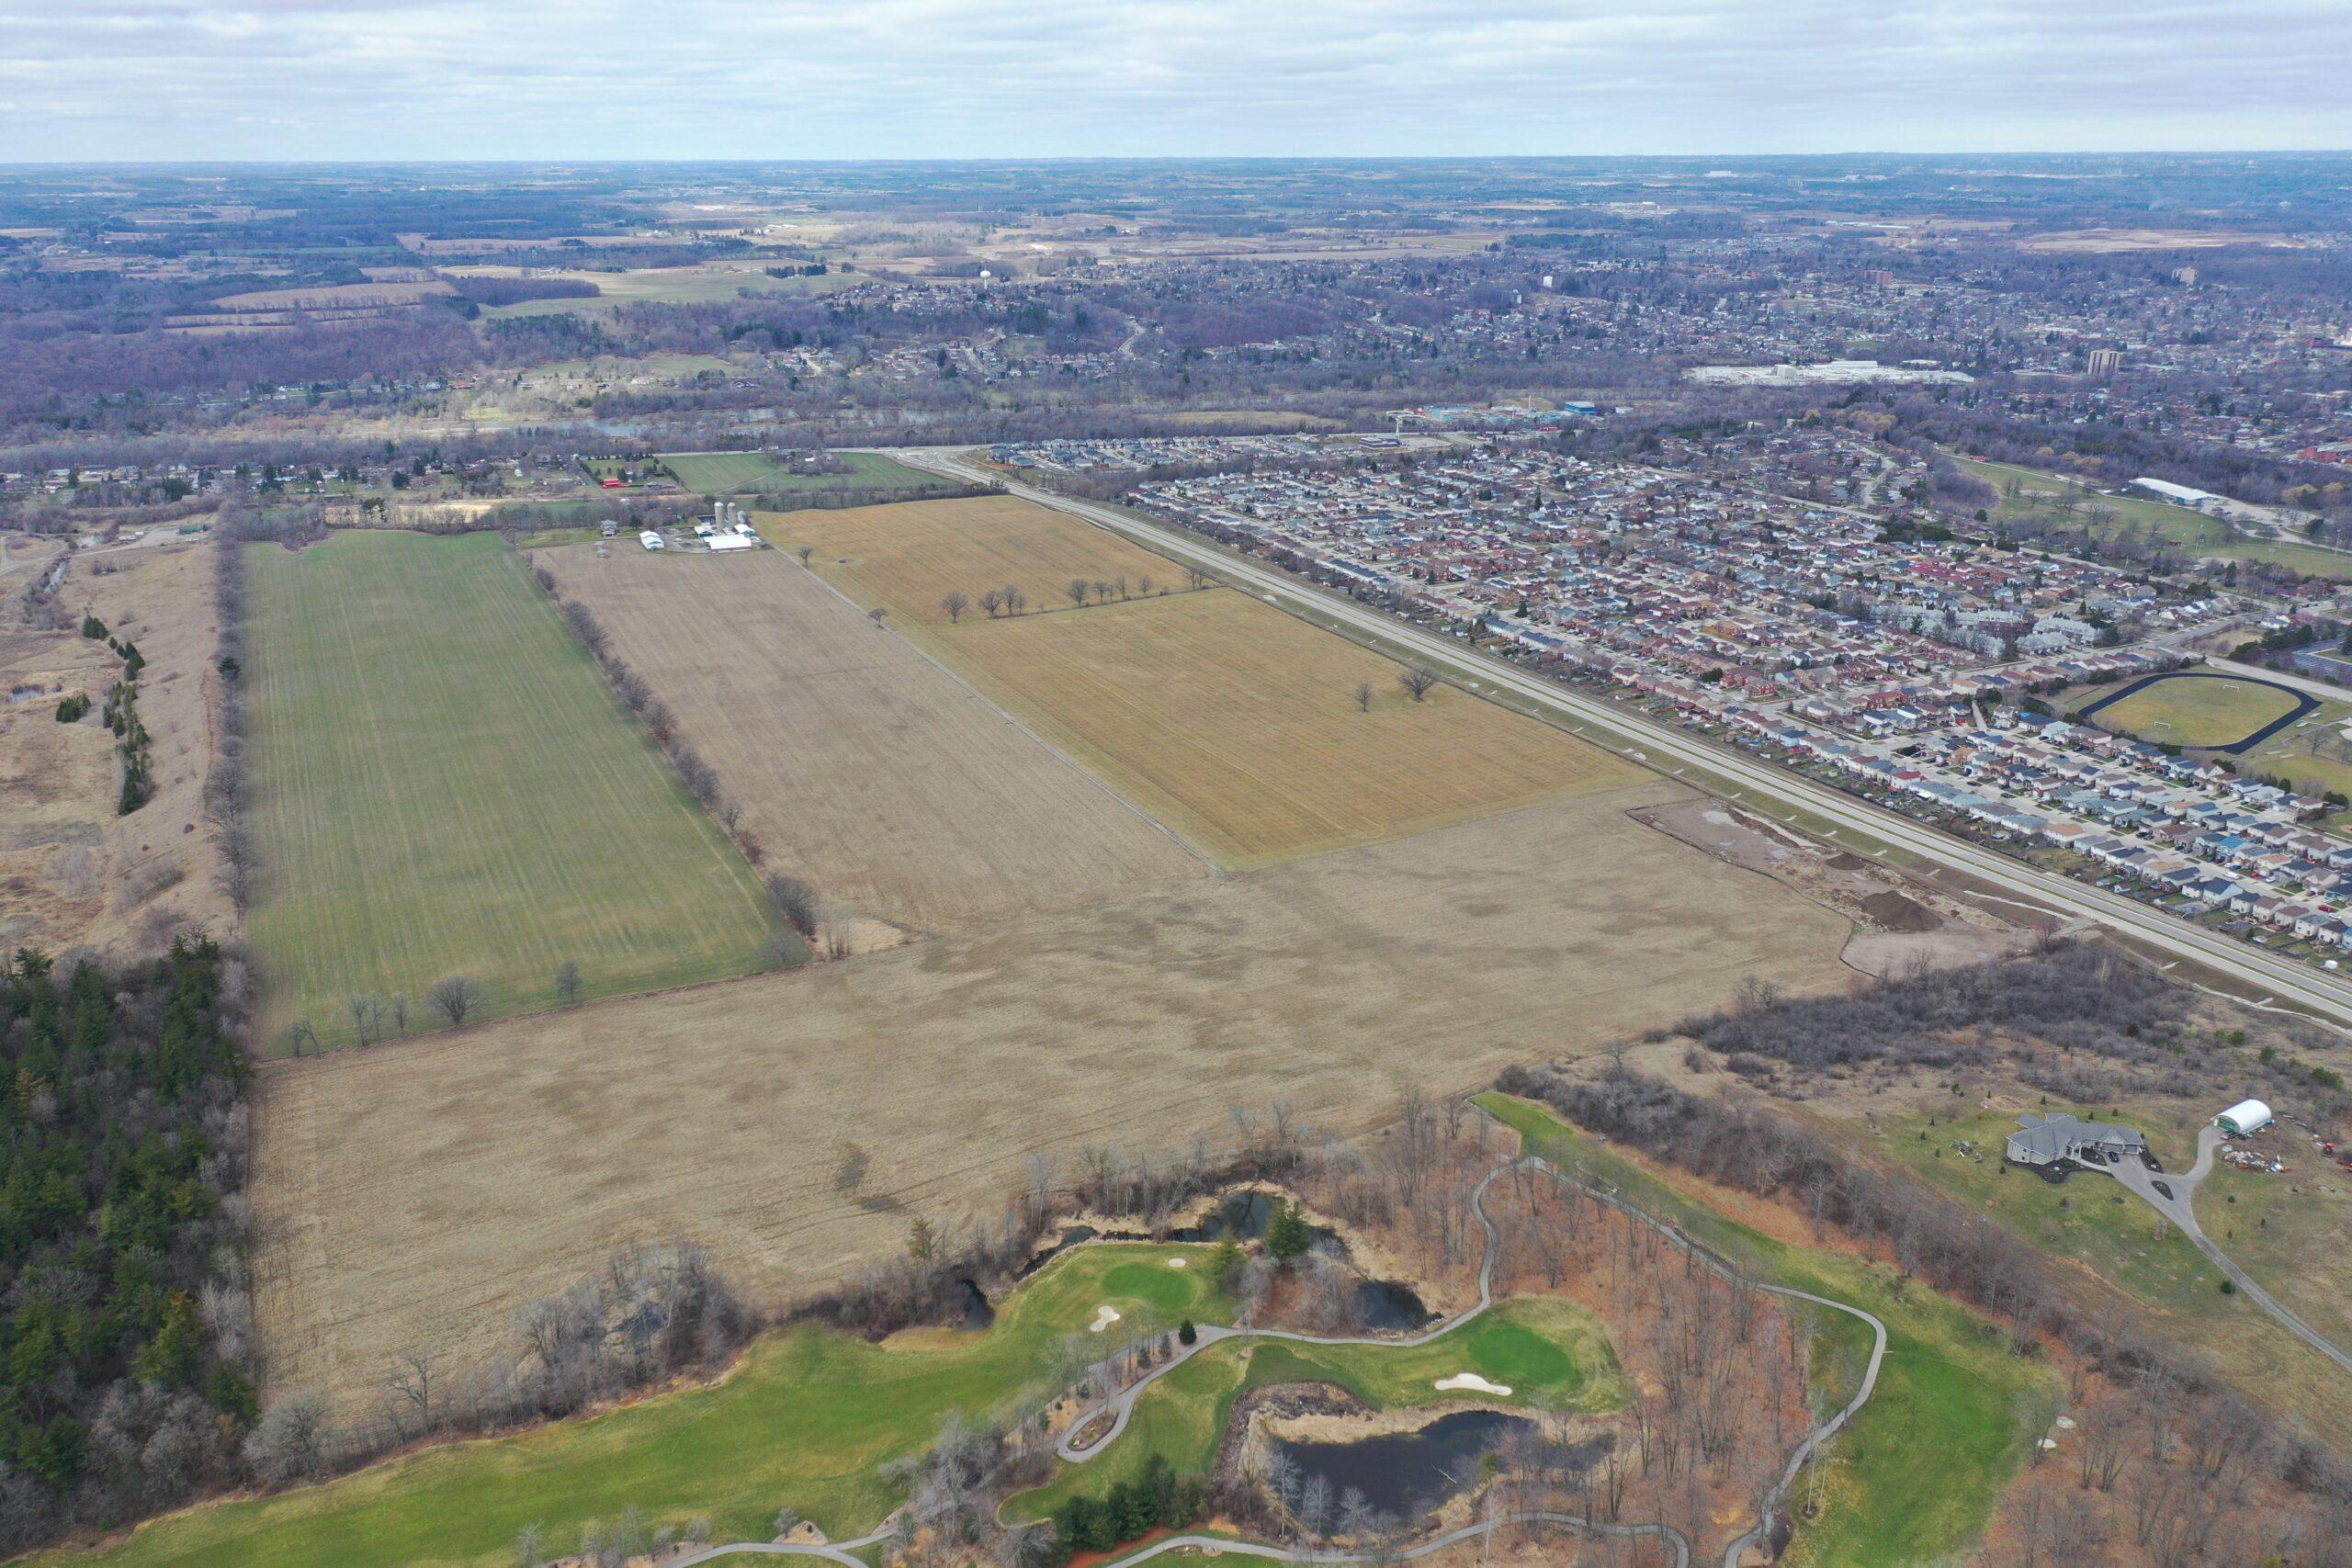 1087 Brantford Hwy, Cambridge | Prime Development Land for Sale